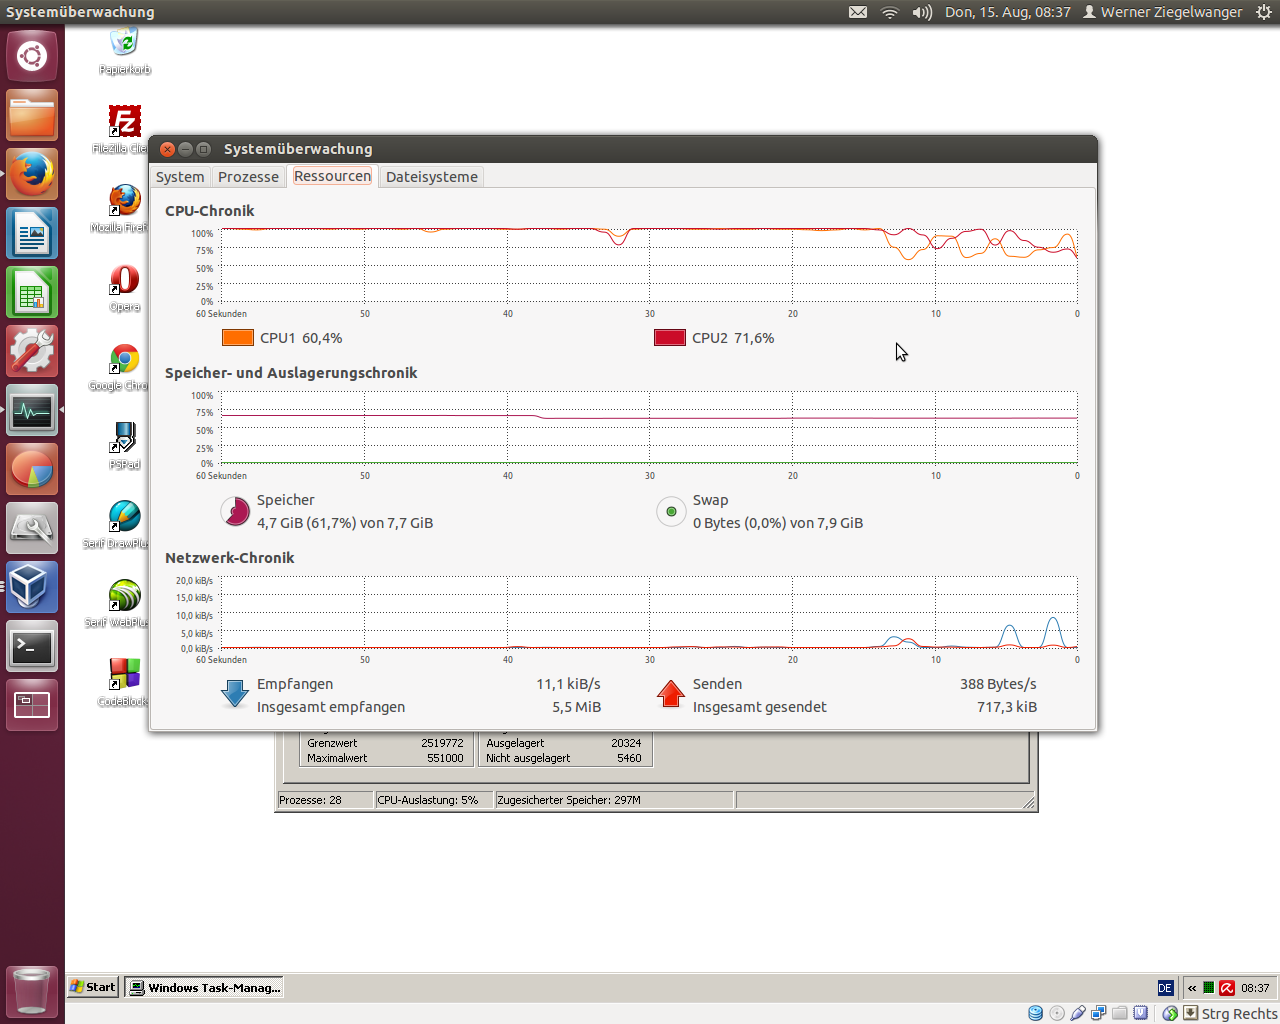 Server CPU Auslastung